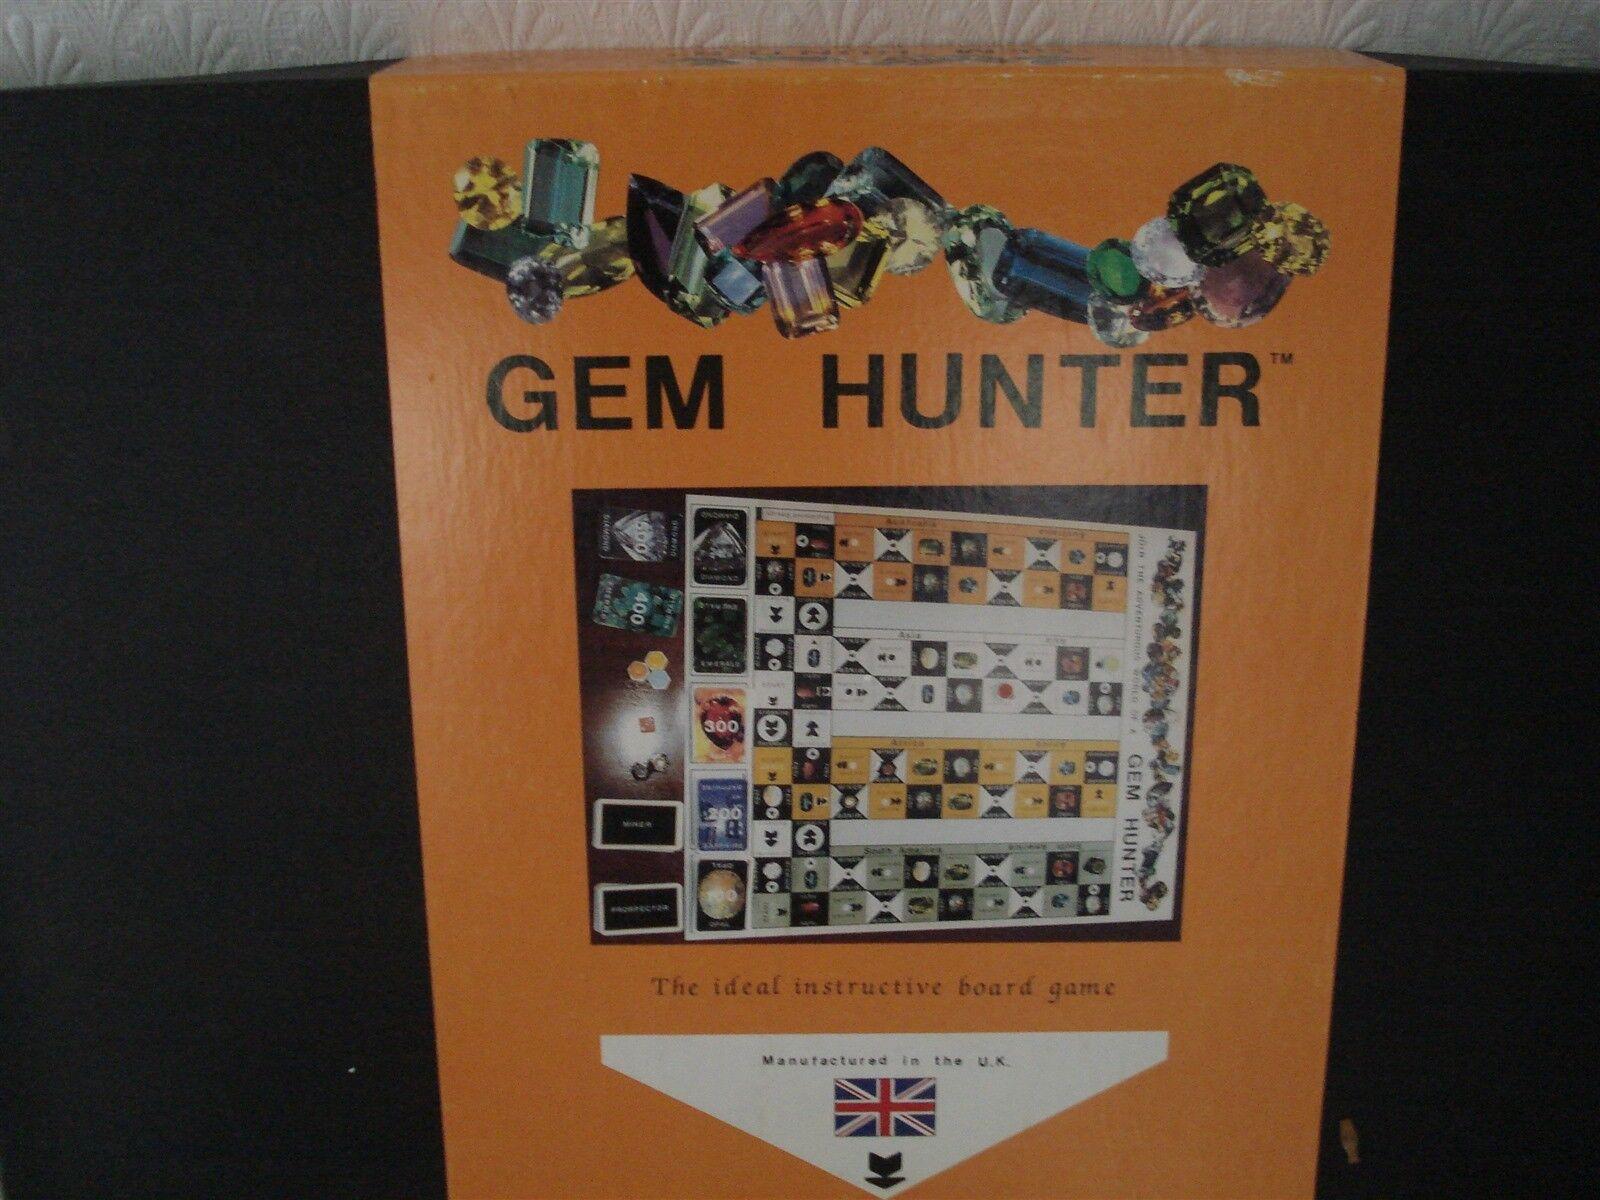 GEM HUNTER GAME - 100% - RARE - COLLECT VARIOUS JEWELLS - GEM HUNTER - VINTAGE